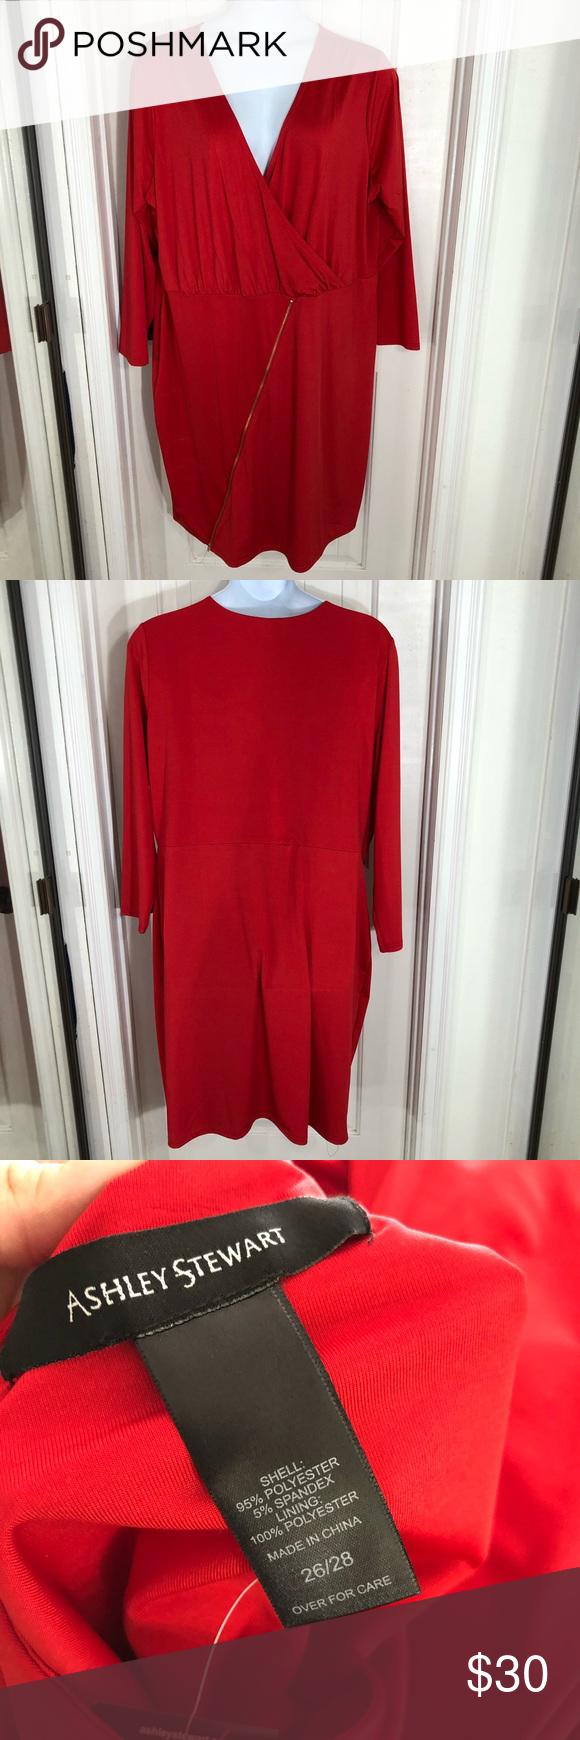 Ashley stewart red long sleeve dress ashley stewart sleeved